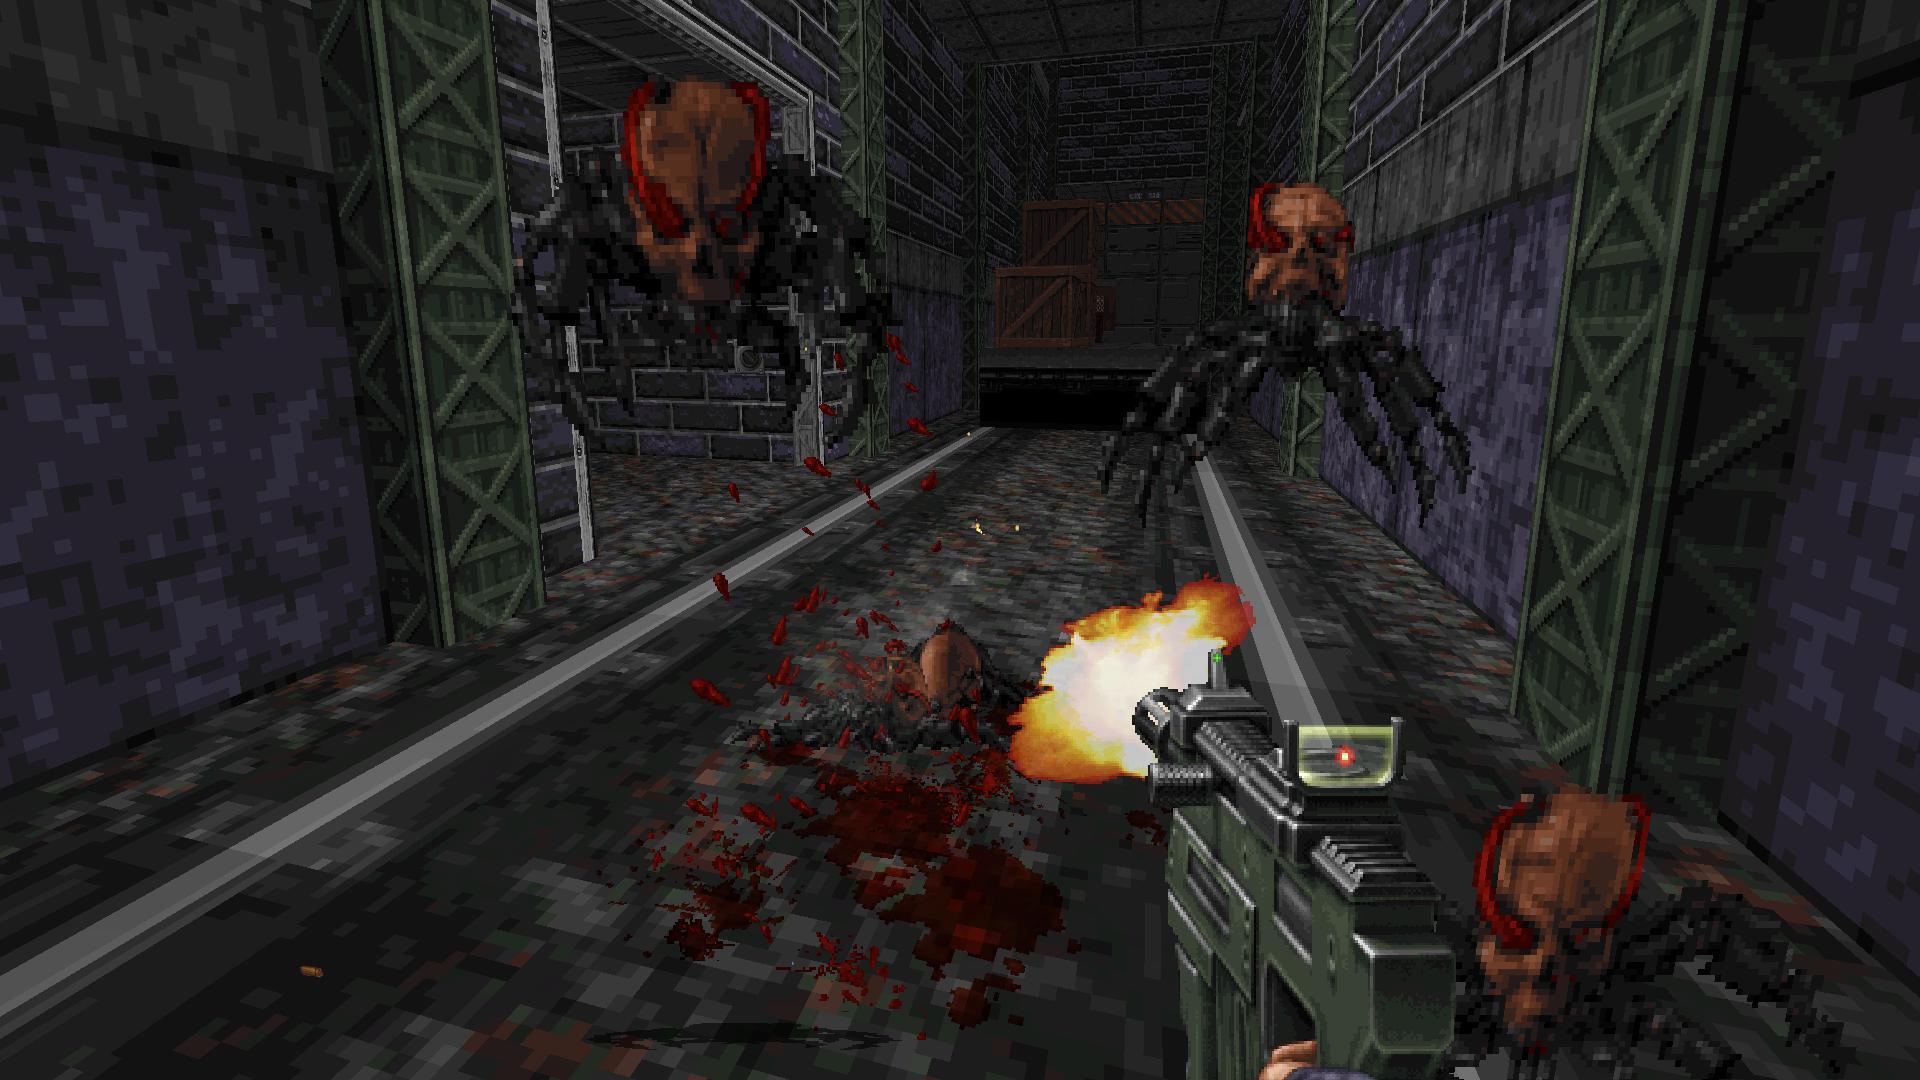 Скриншот из игры Ion Fury